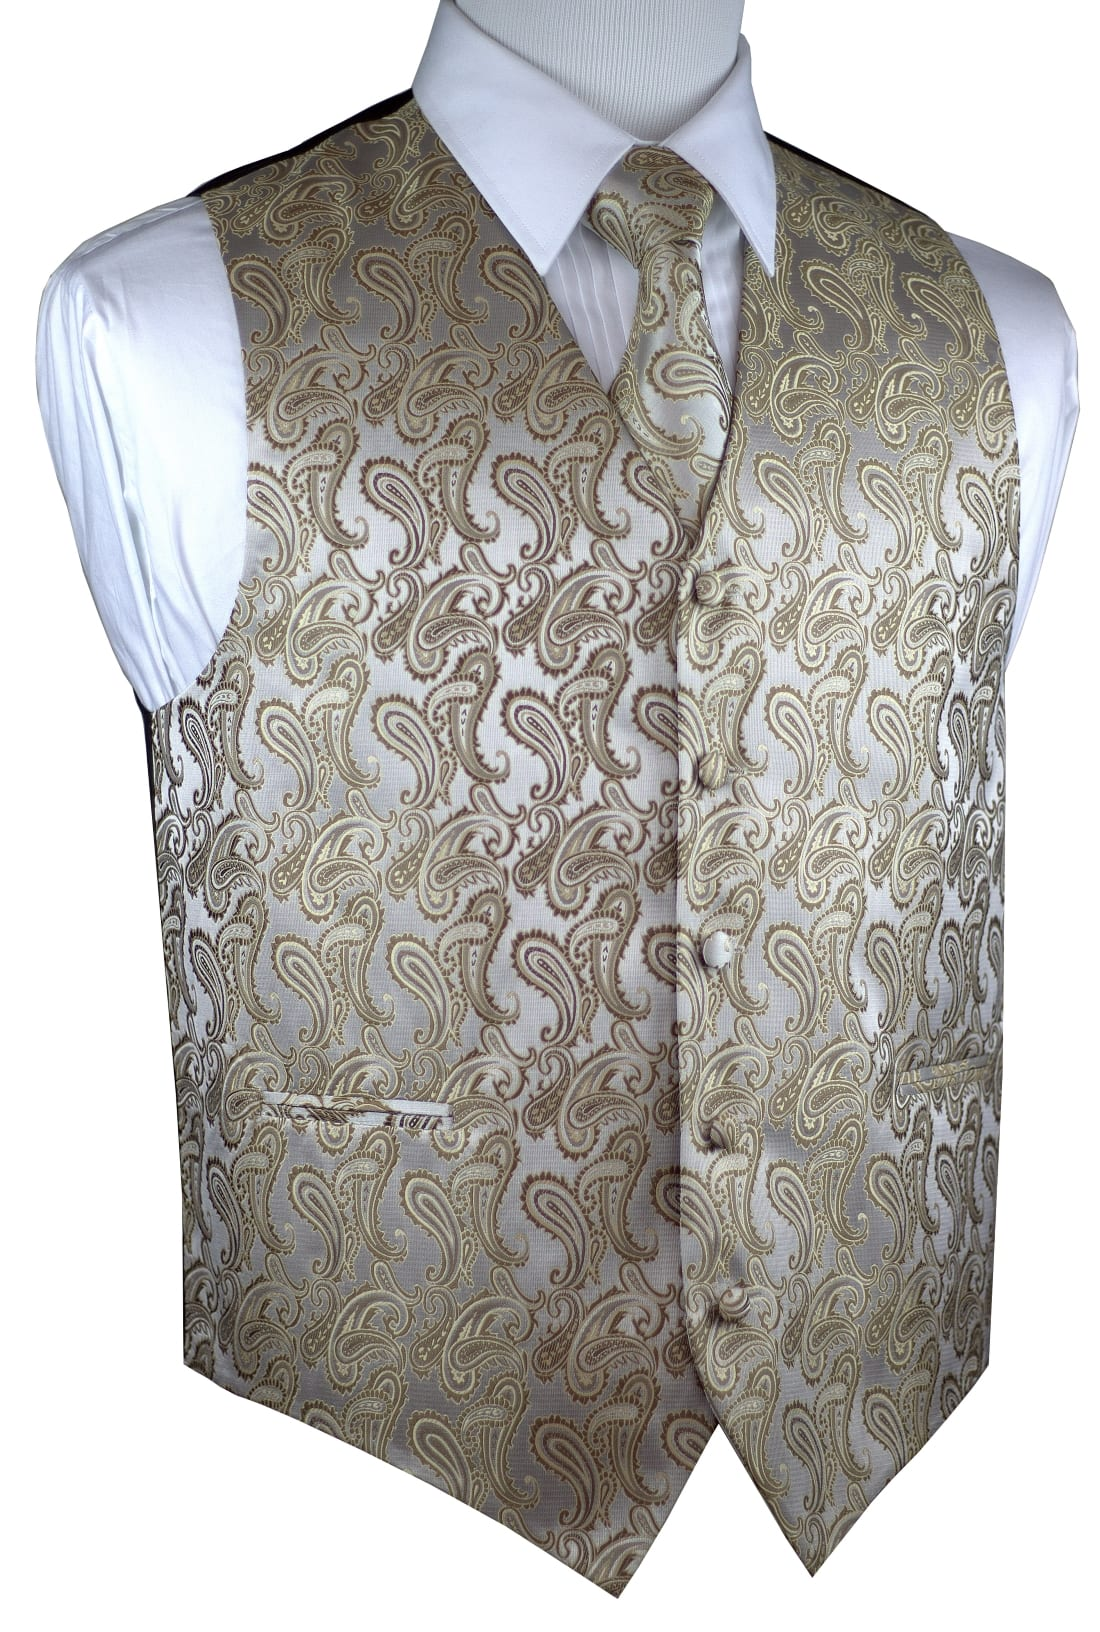 MEN/'S BURNT ORANGE PAISLEY FORMAL DRESS TUXEDO VEST /& BOW-TIE SET WEDDING PROM